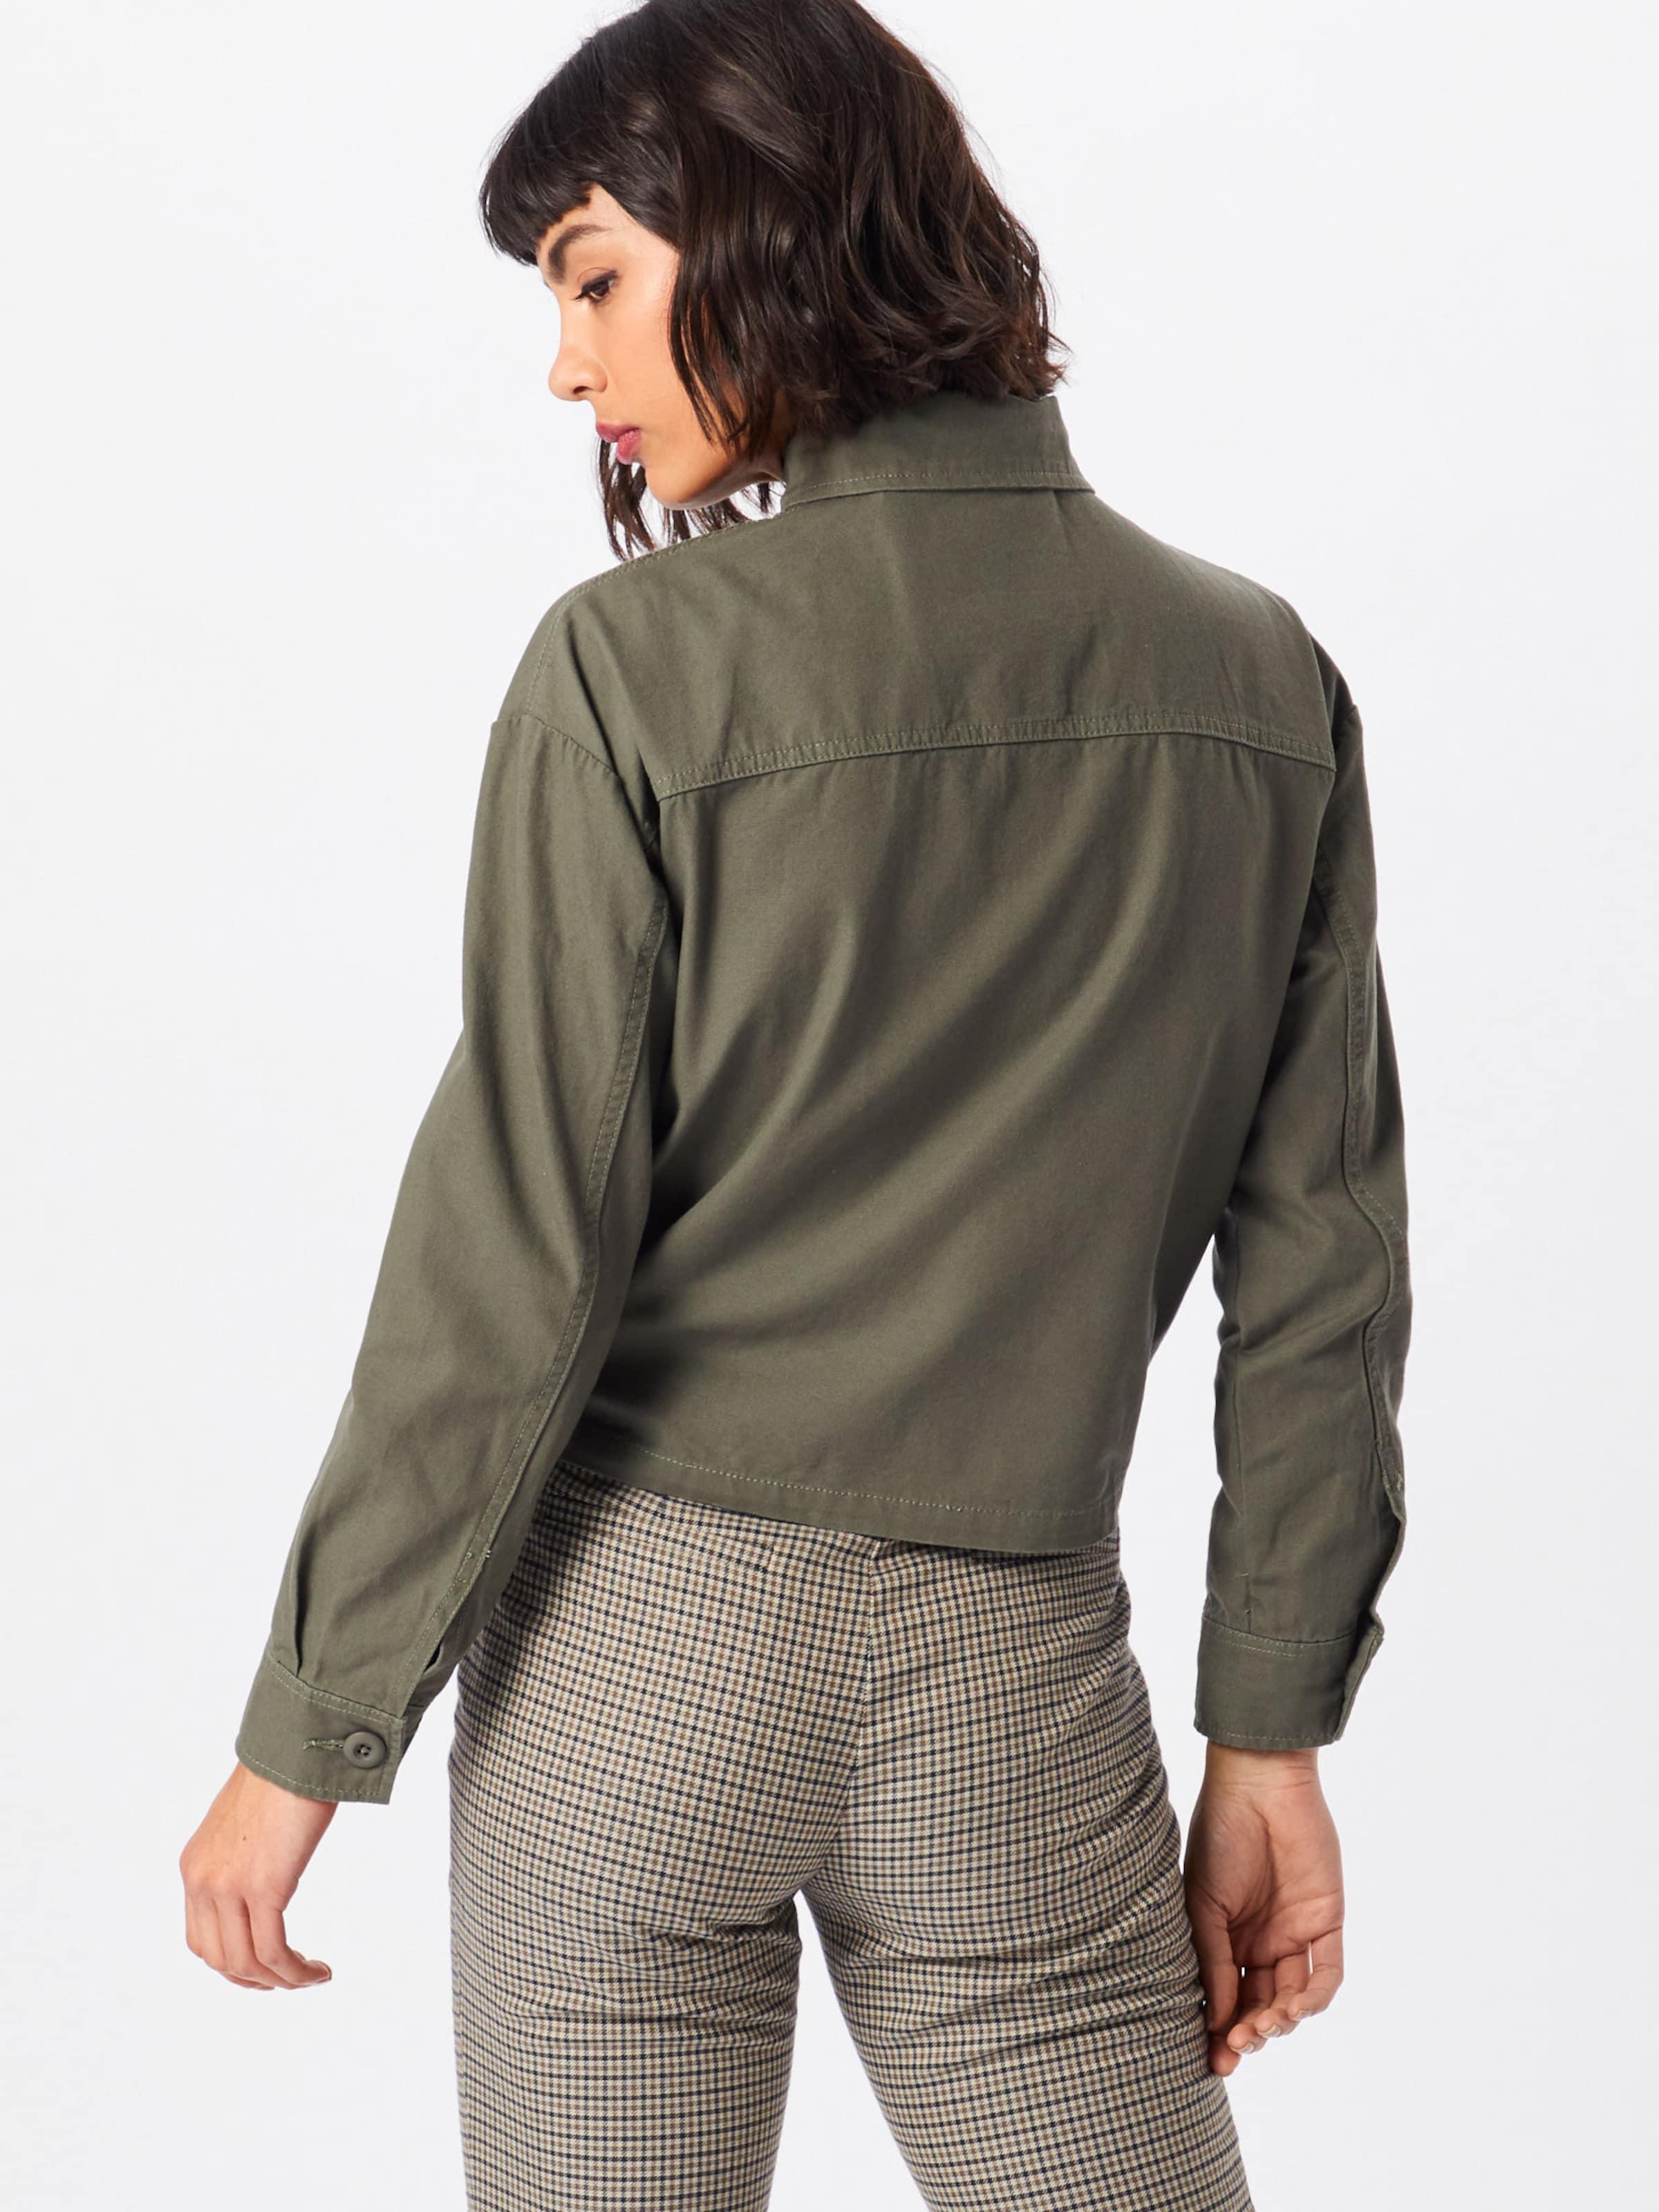 Khaki Look 'bonnie Utility Shacket' In Jacke New Cropped hQdBtsCxro